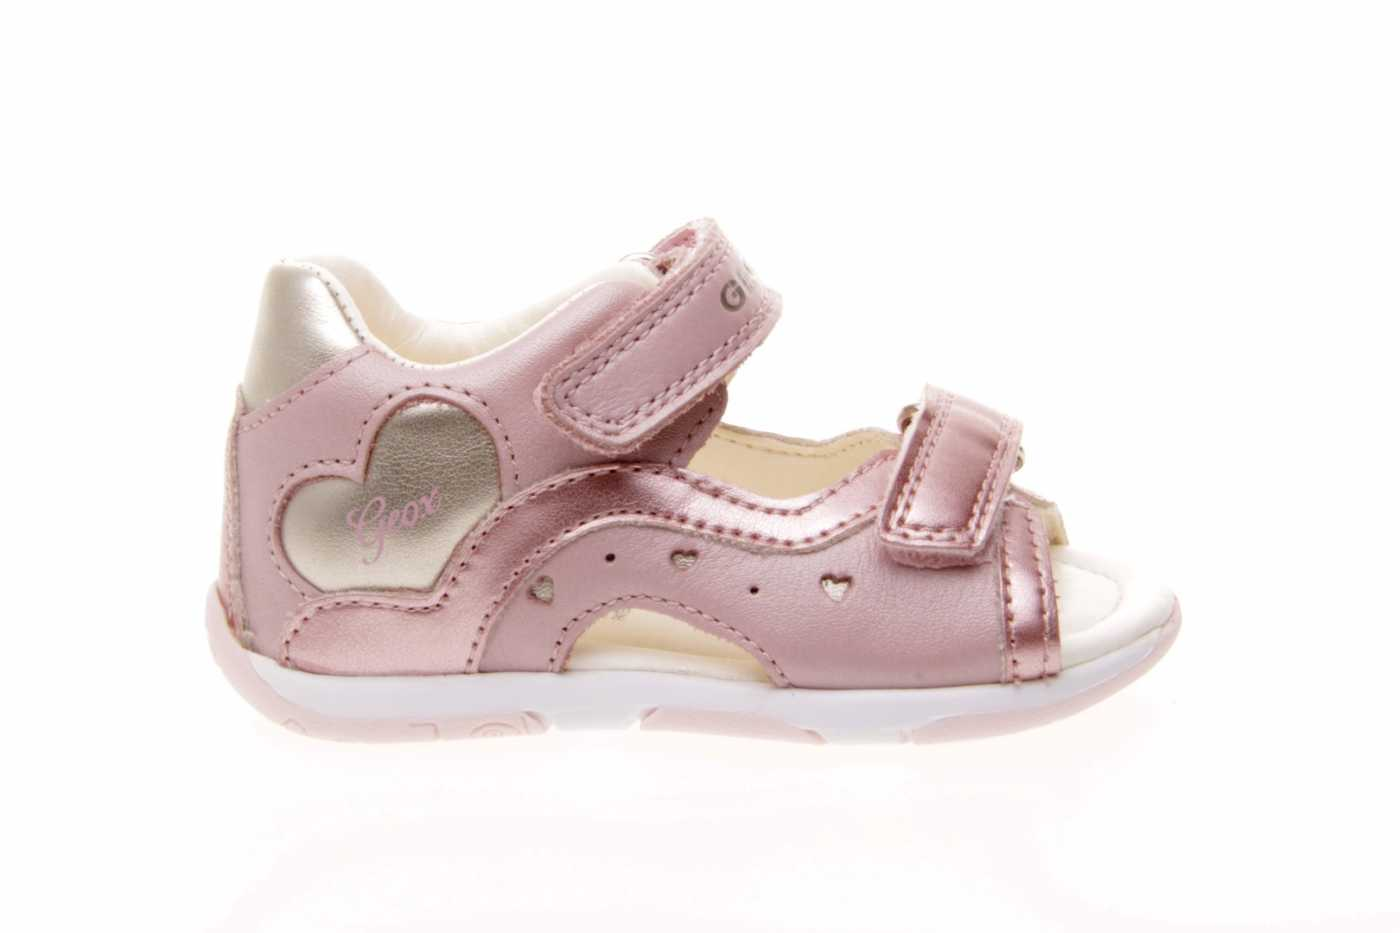 6d622b6d Comprar zapato tipo PREANDANTE NIÑA estilo SANDALIA COLOR ROSA PIEL ...